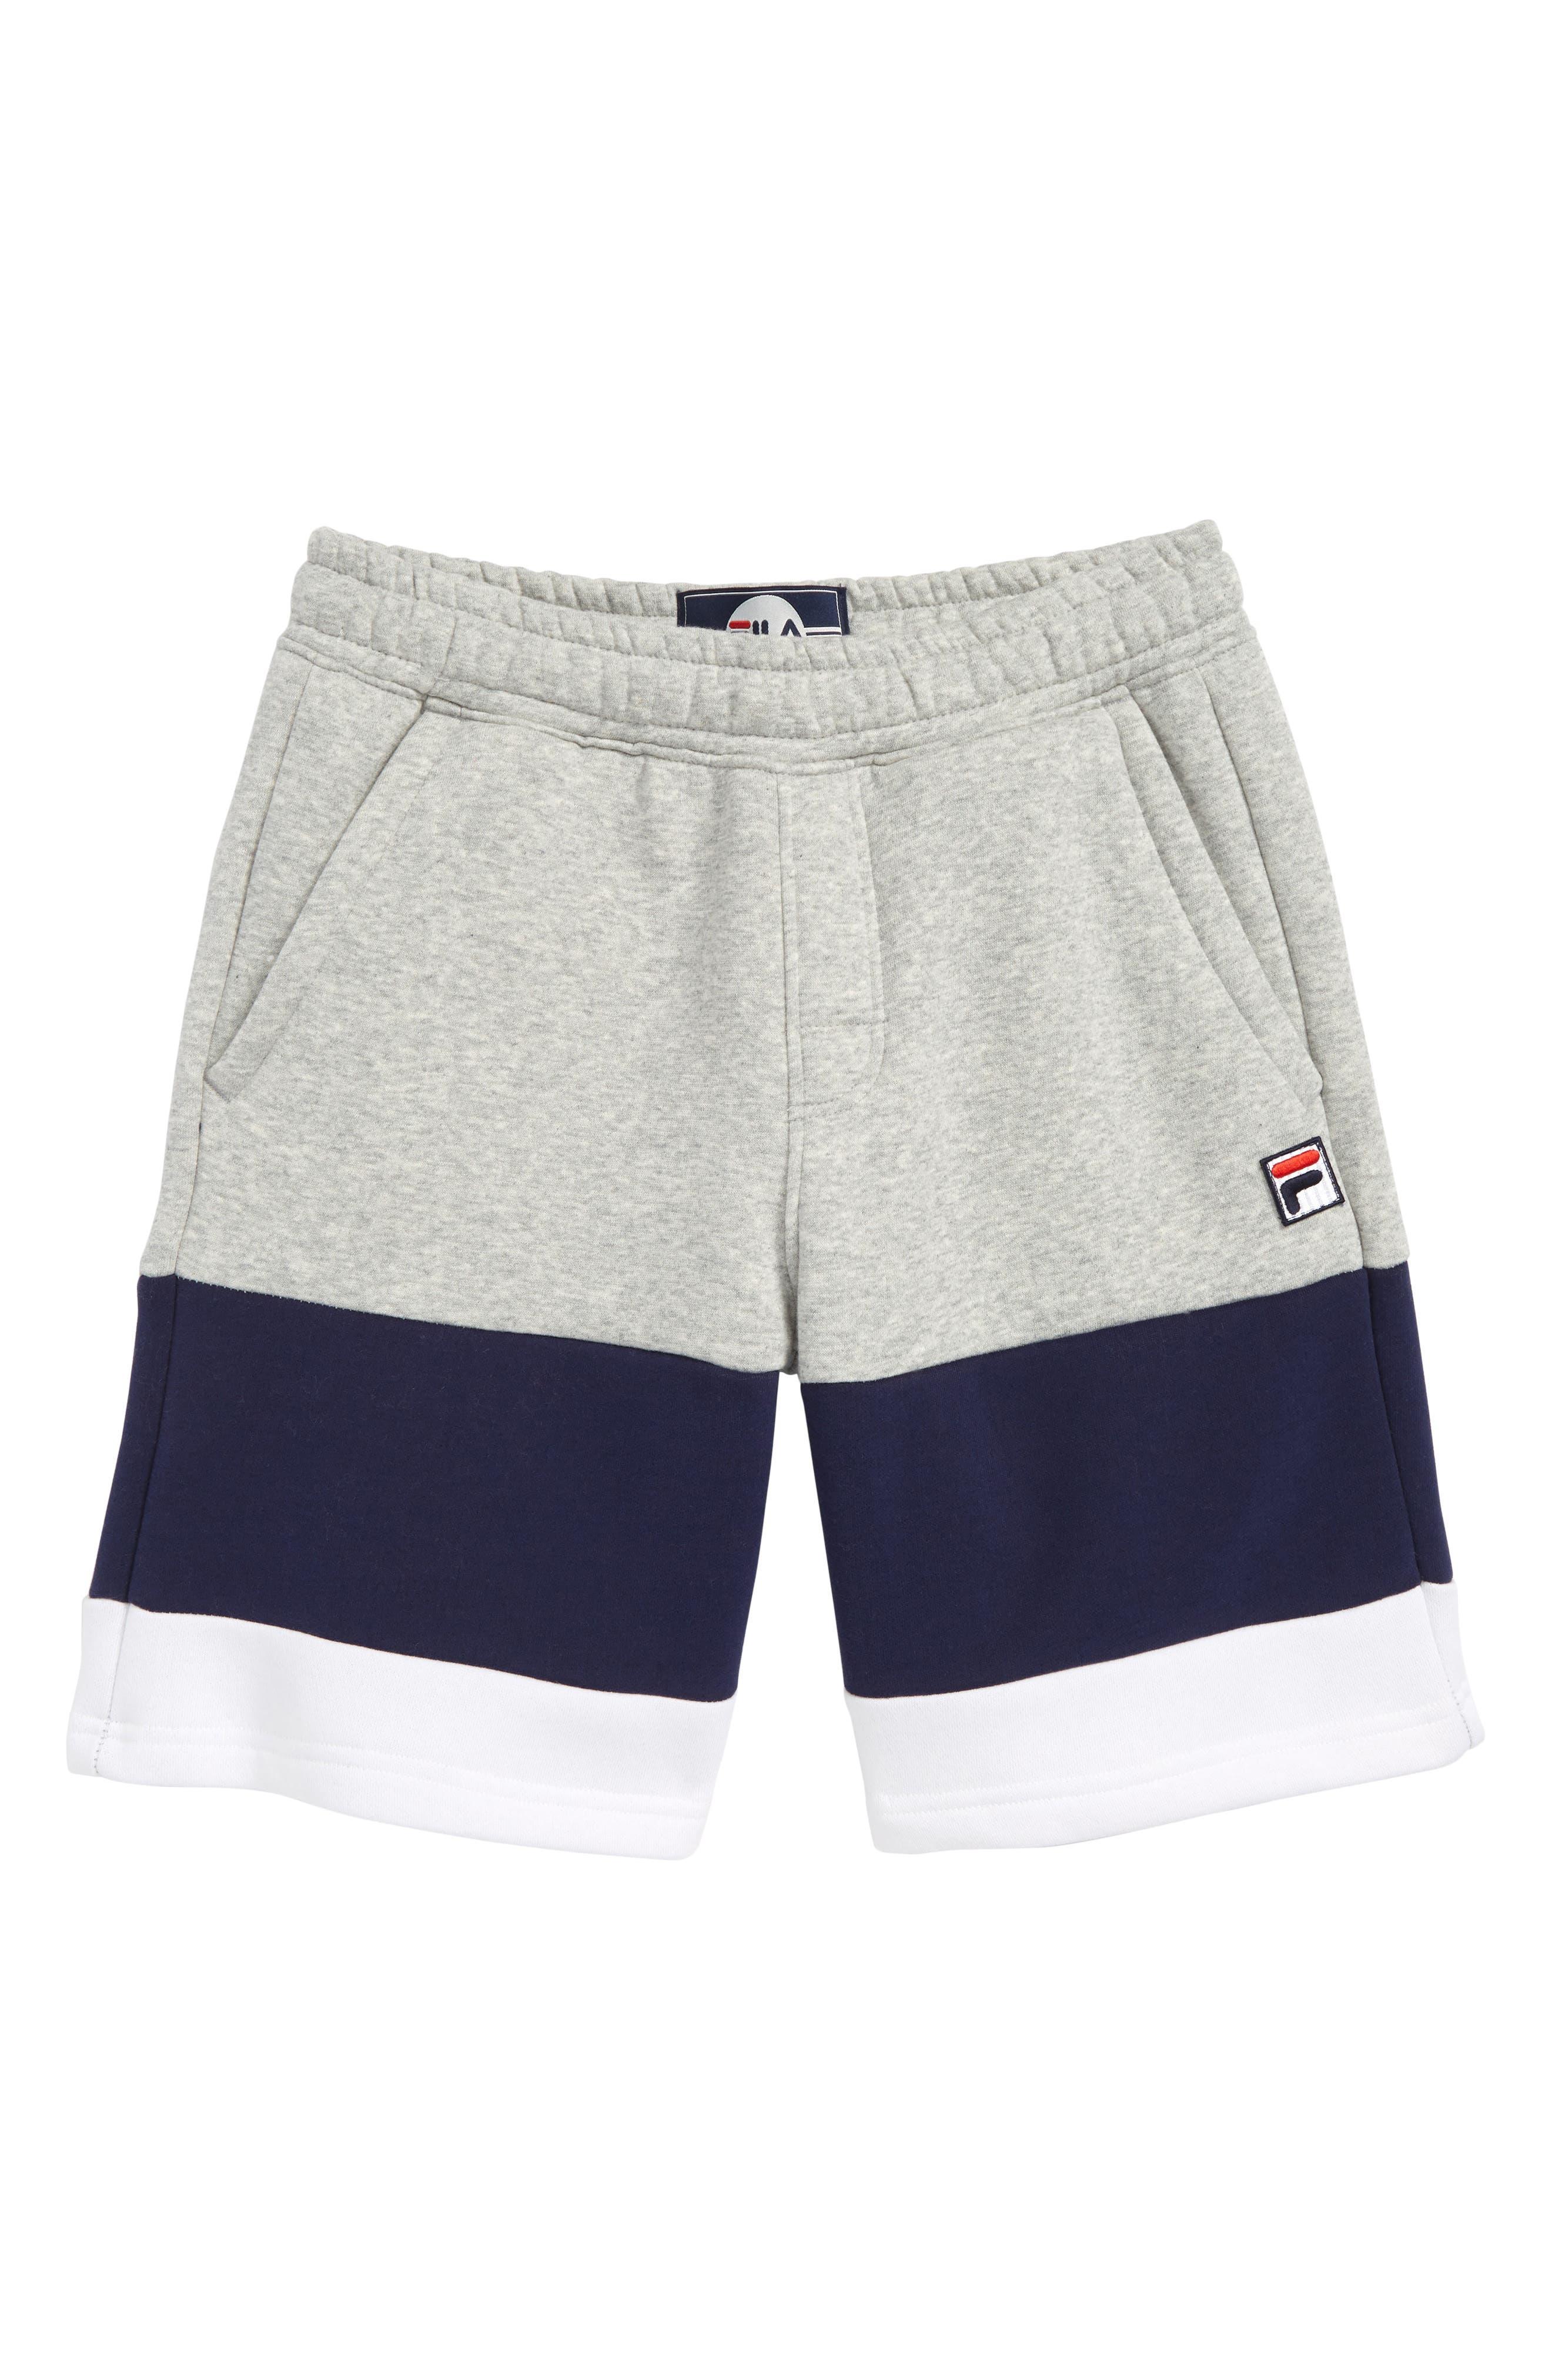 Colorblock Sweat Shorts,                             Main thumbnail 1, color,                             050